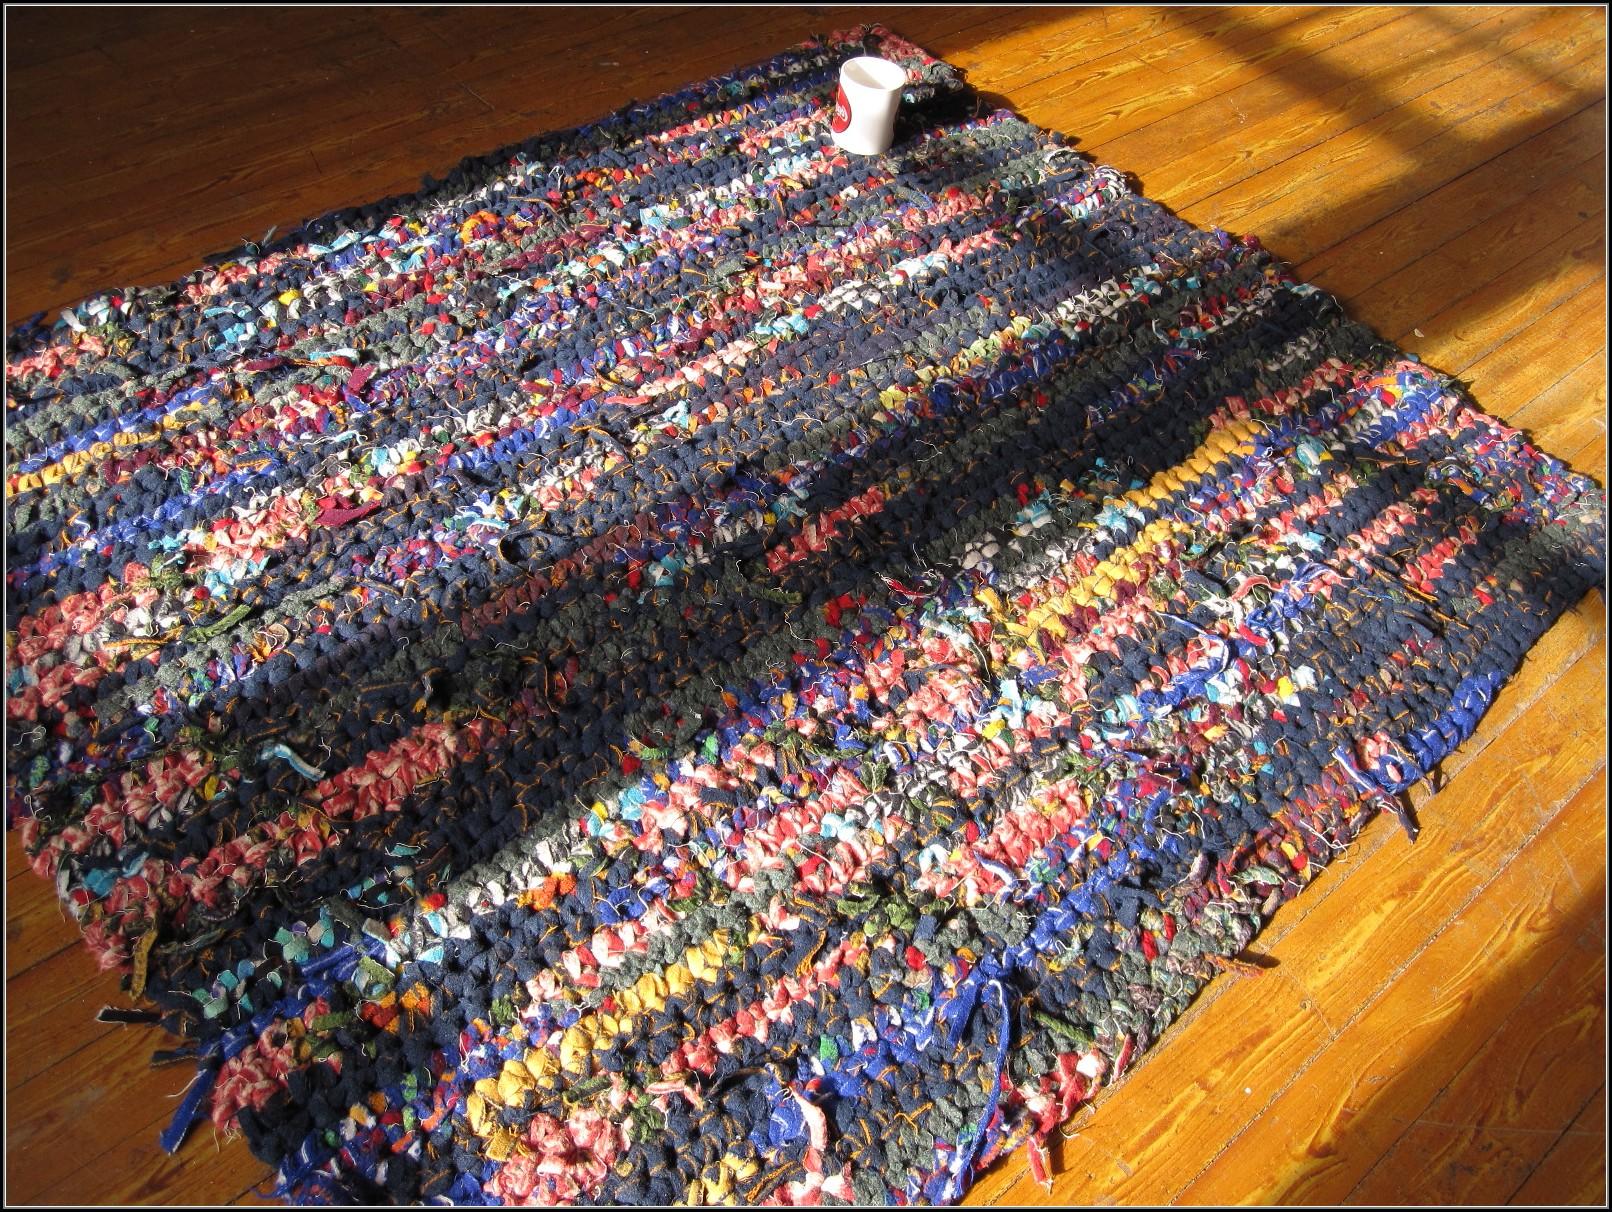 Crochet Rag Rugs Diy Rugs Home Decorating Ideas M4kxllnkem